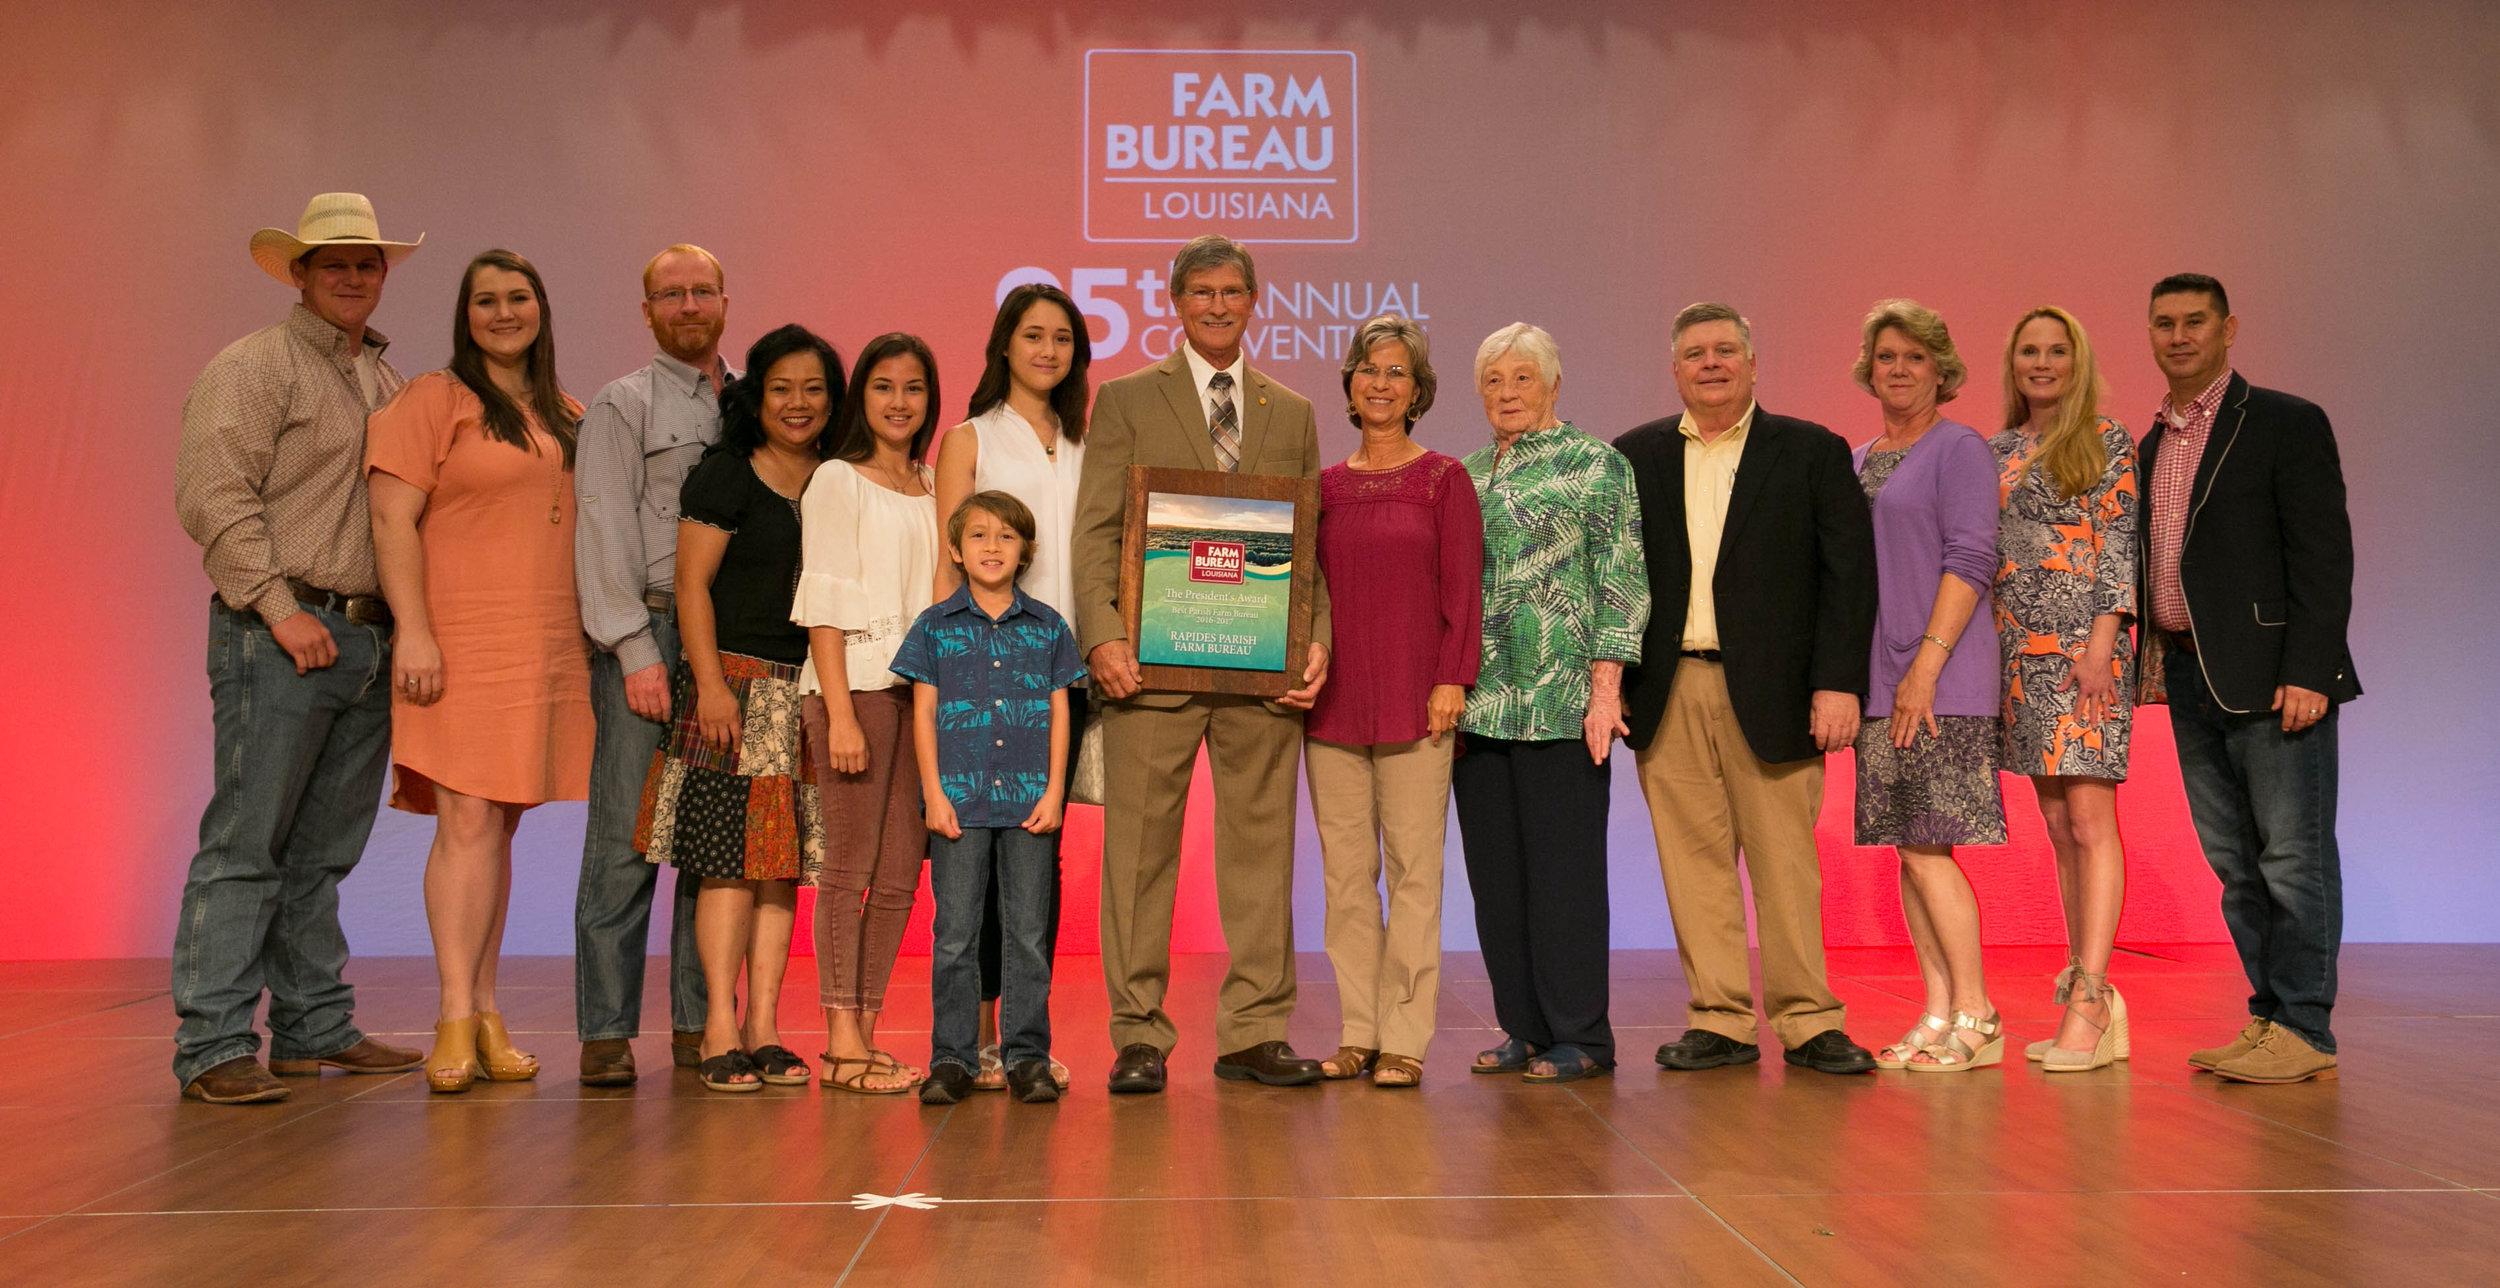 Rapides Farm Bureau delegates celebrate winning the 2017 Louisiana Farm Bureau President's Trophy.